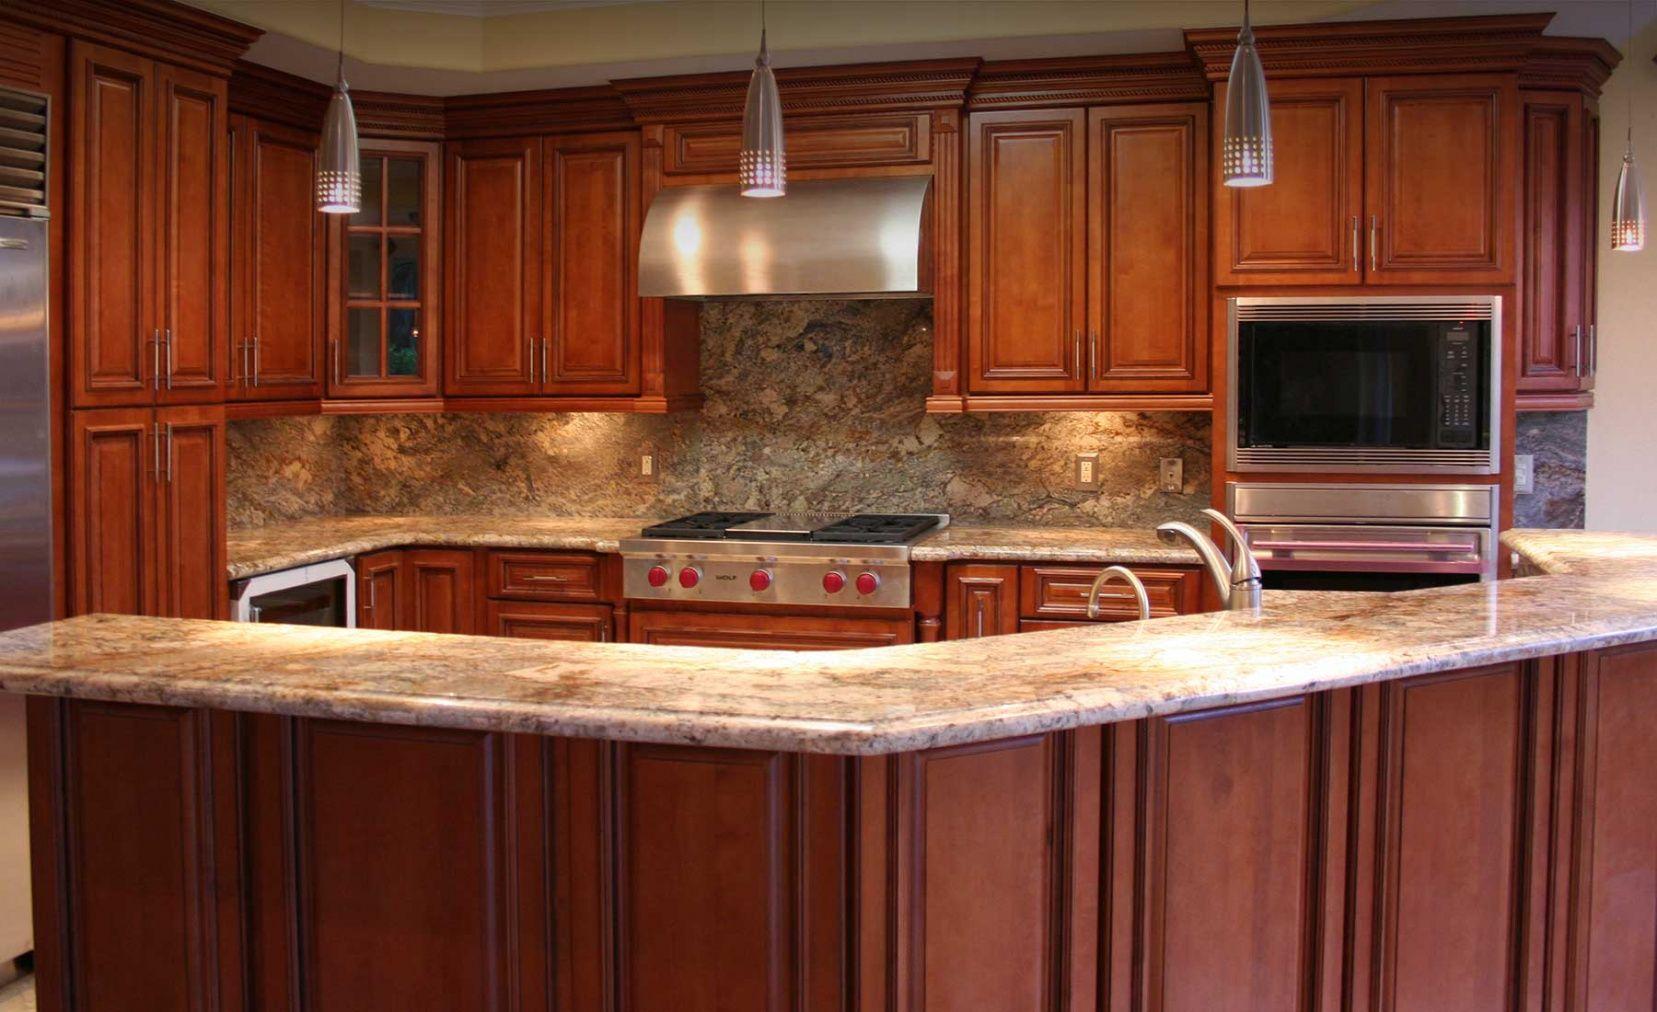 77+ where to Buy Granite Countertops Cheap - Kitchen ...